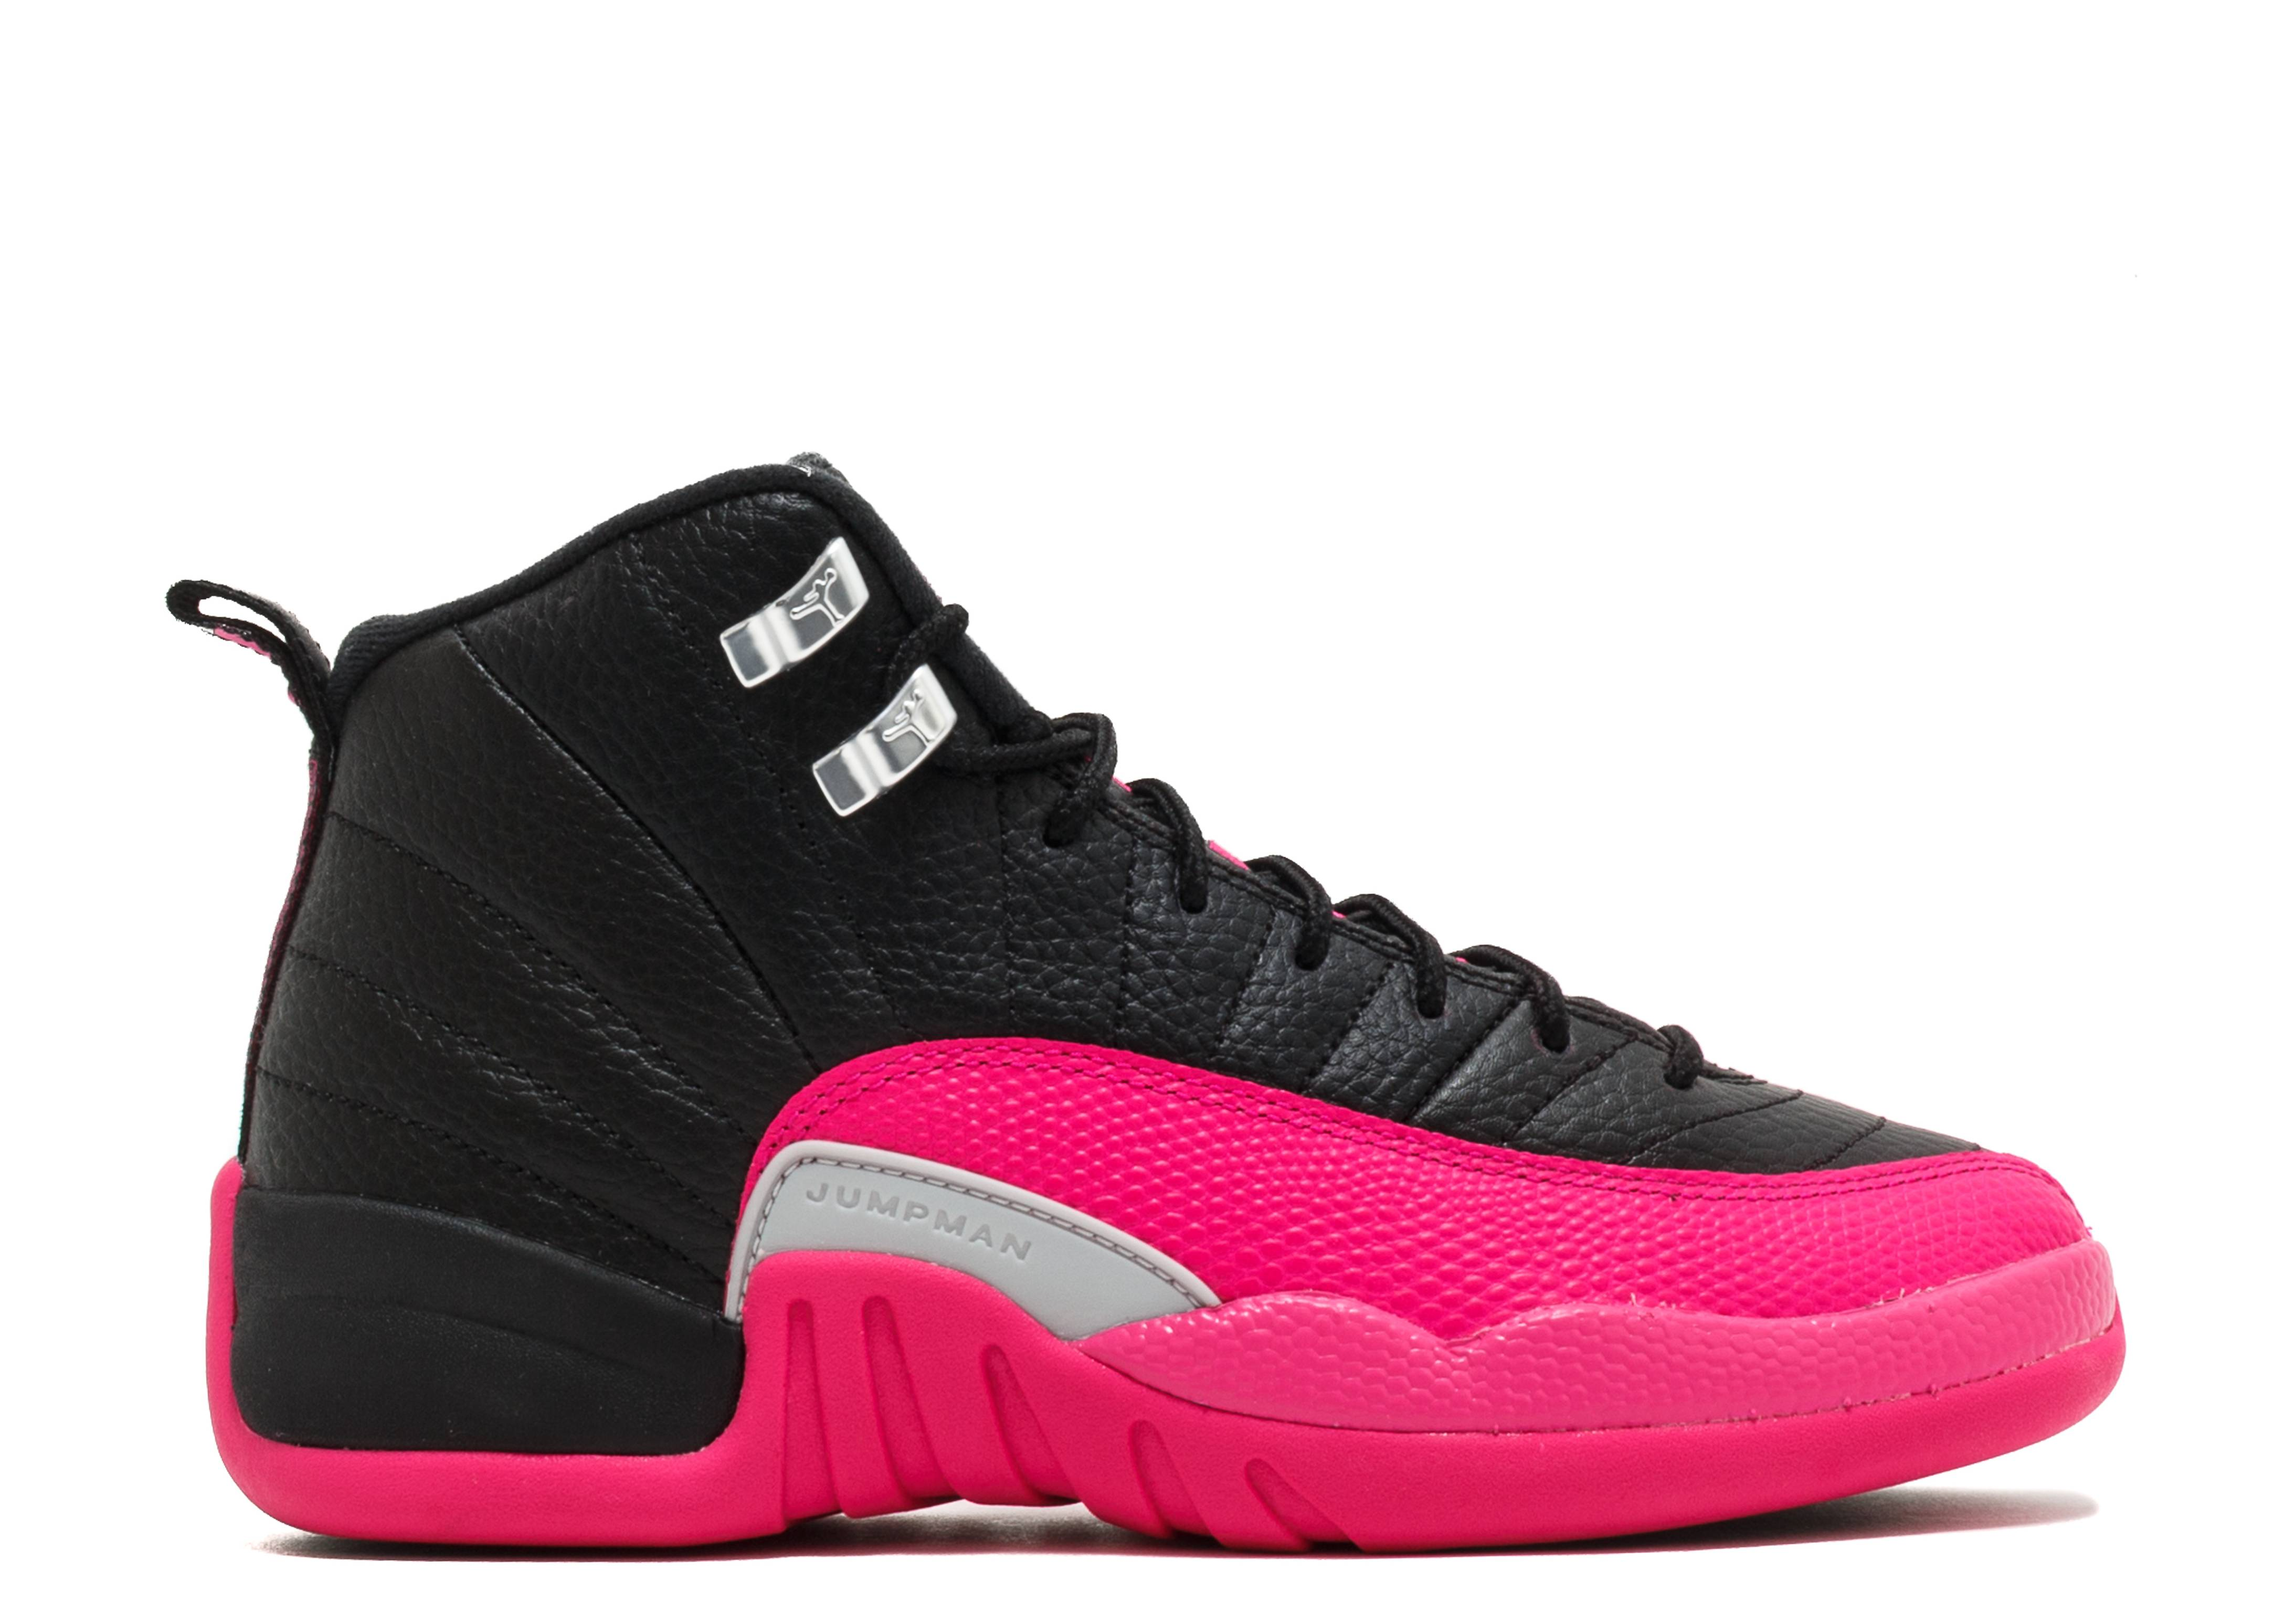 15a4f189e3b9d6 Air Jordan 12 (XII) Shoes - Nike